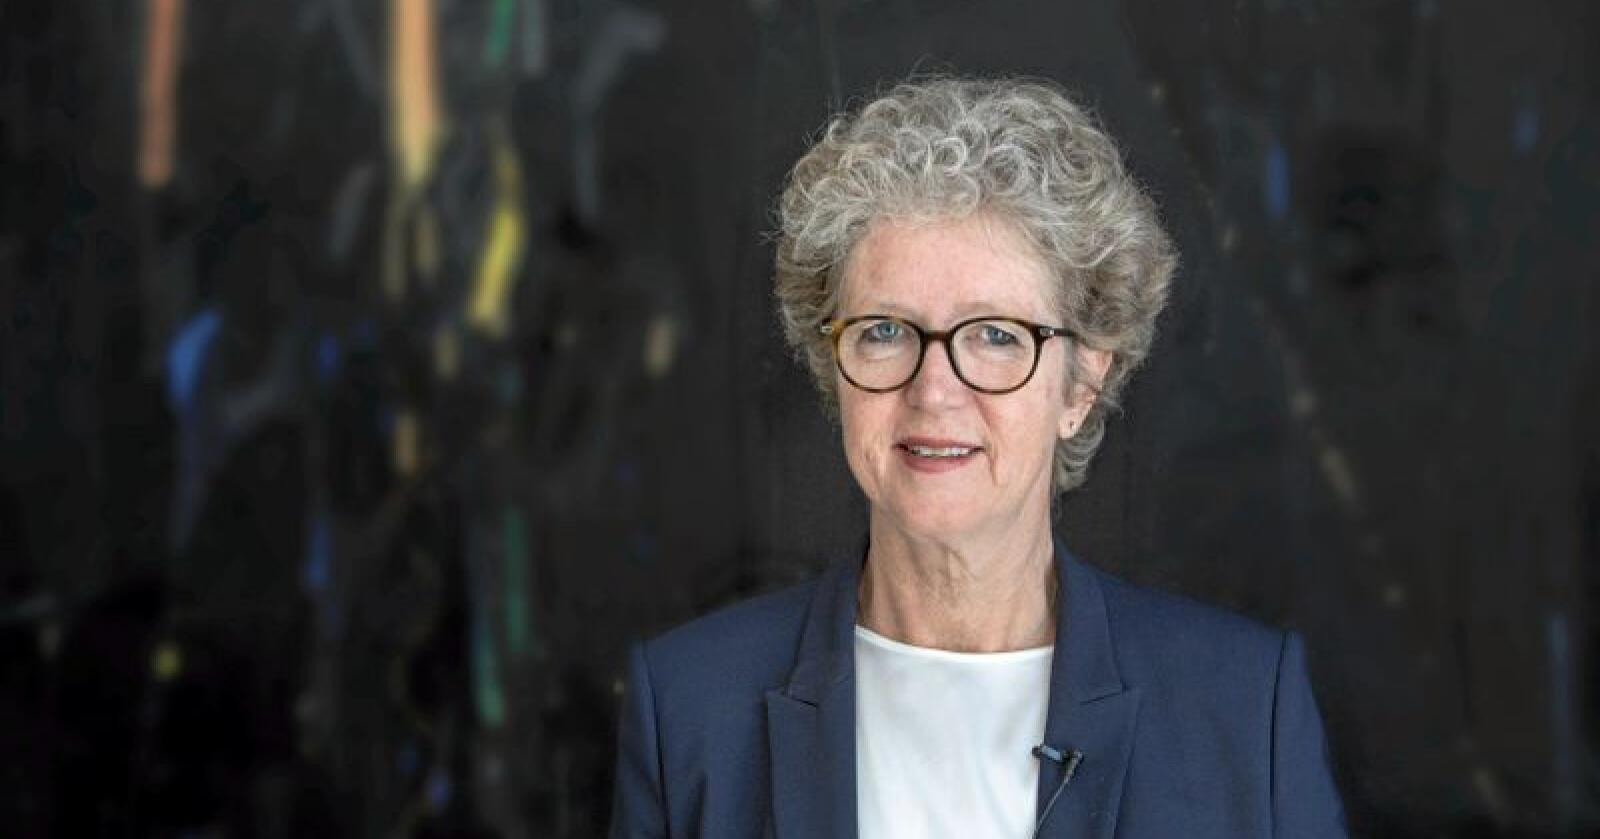 Hilde Merete Aasheim overtok som konsernsjef i Norsk Hydro 8. mai i år. Foto: Ole Berg-Rusten / NTB Scanpix